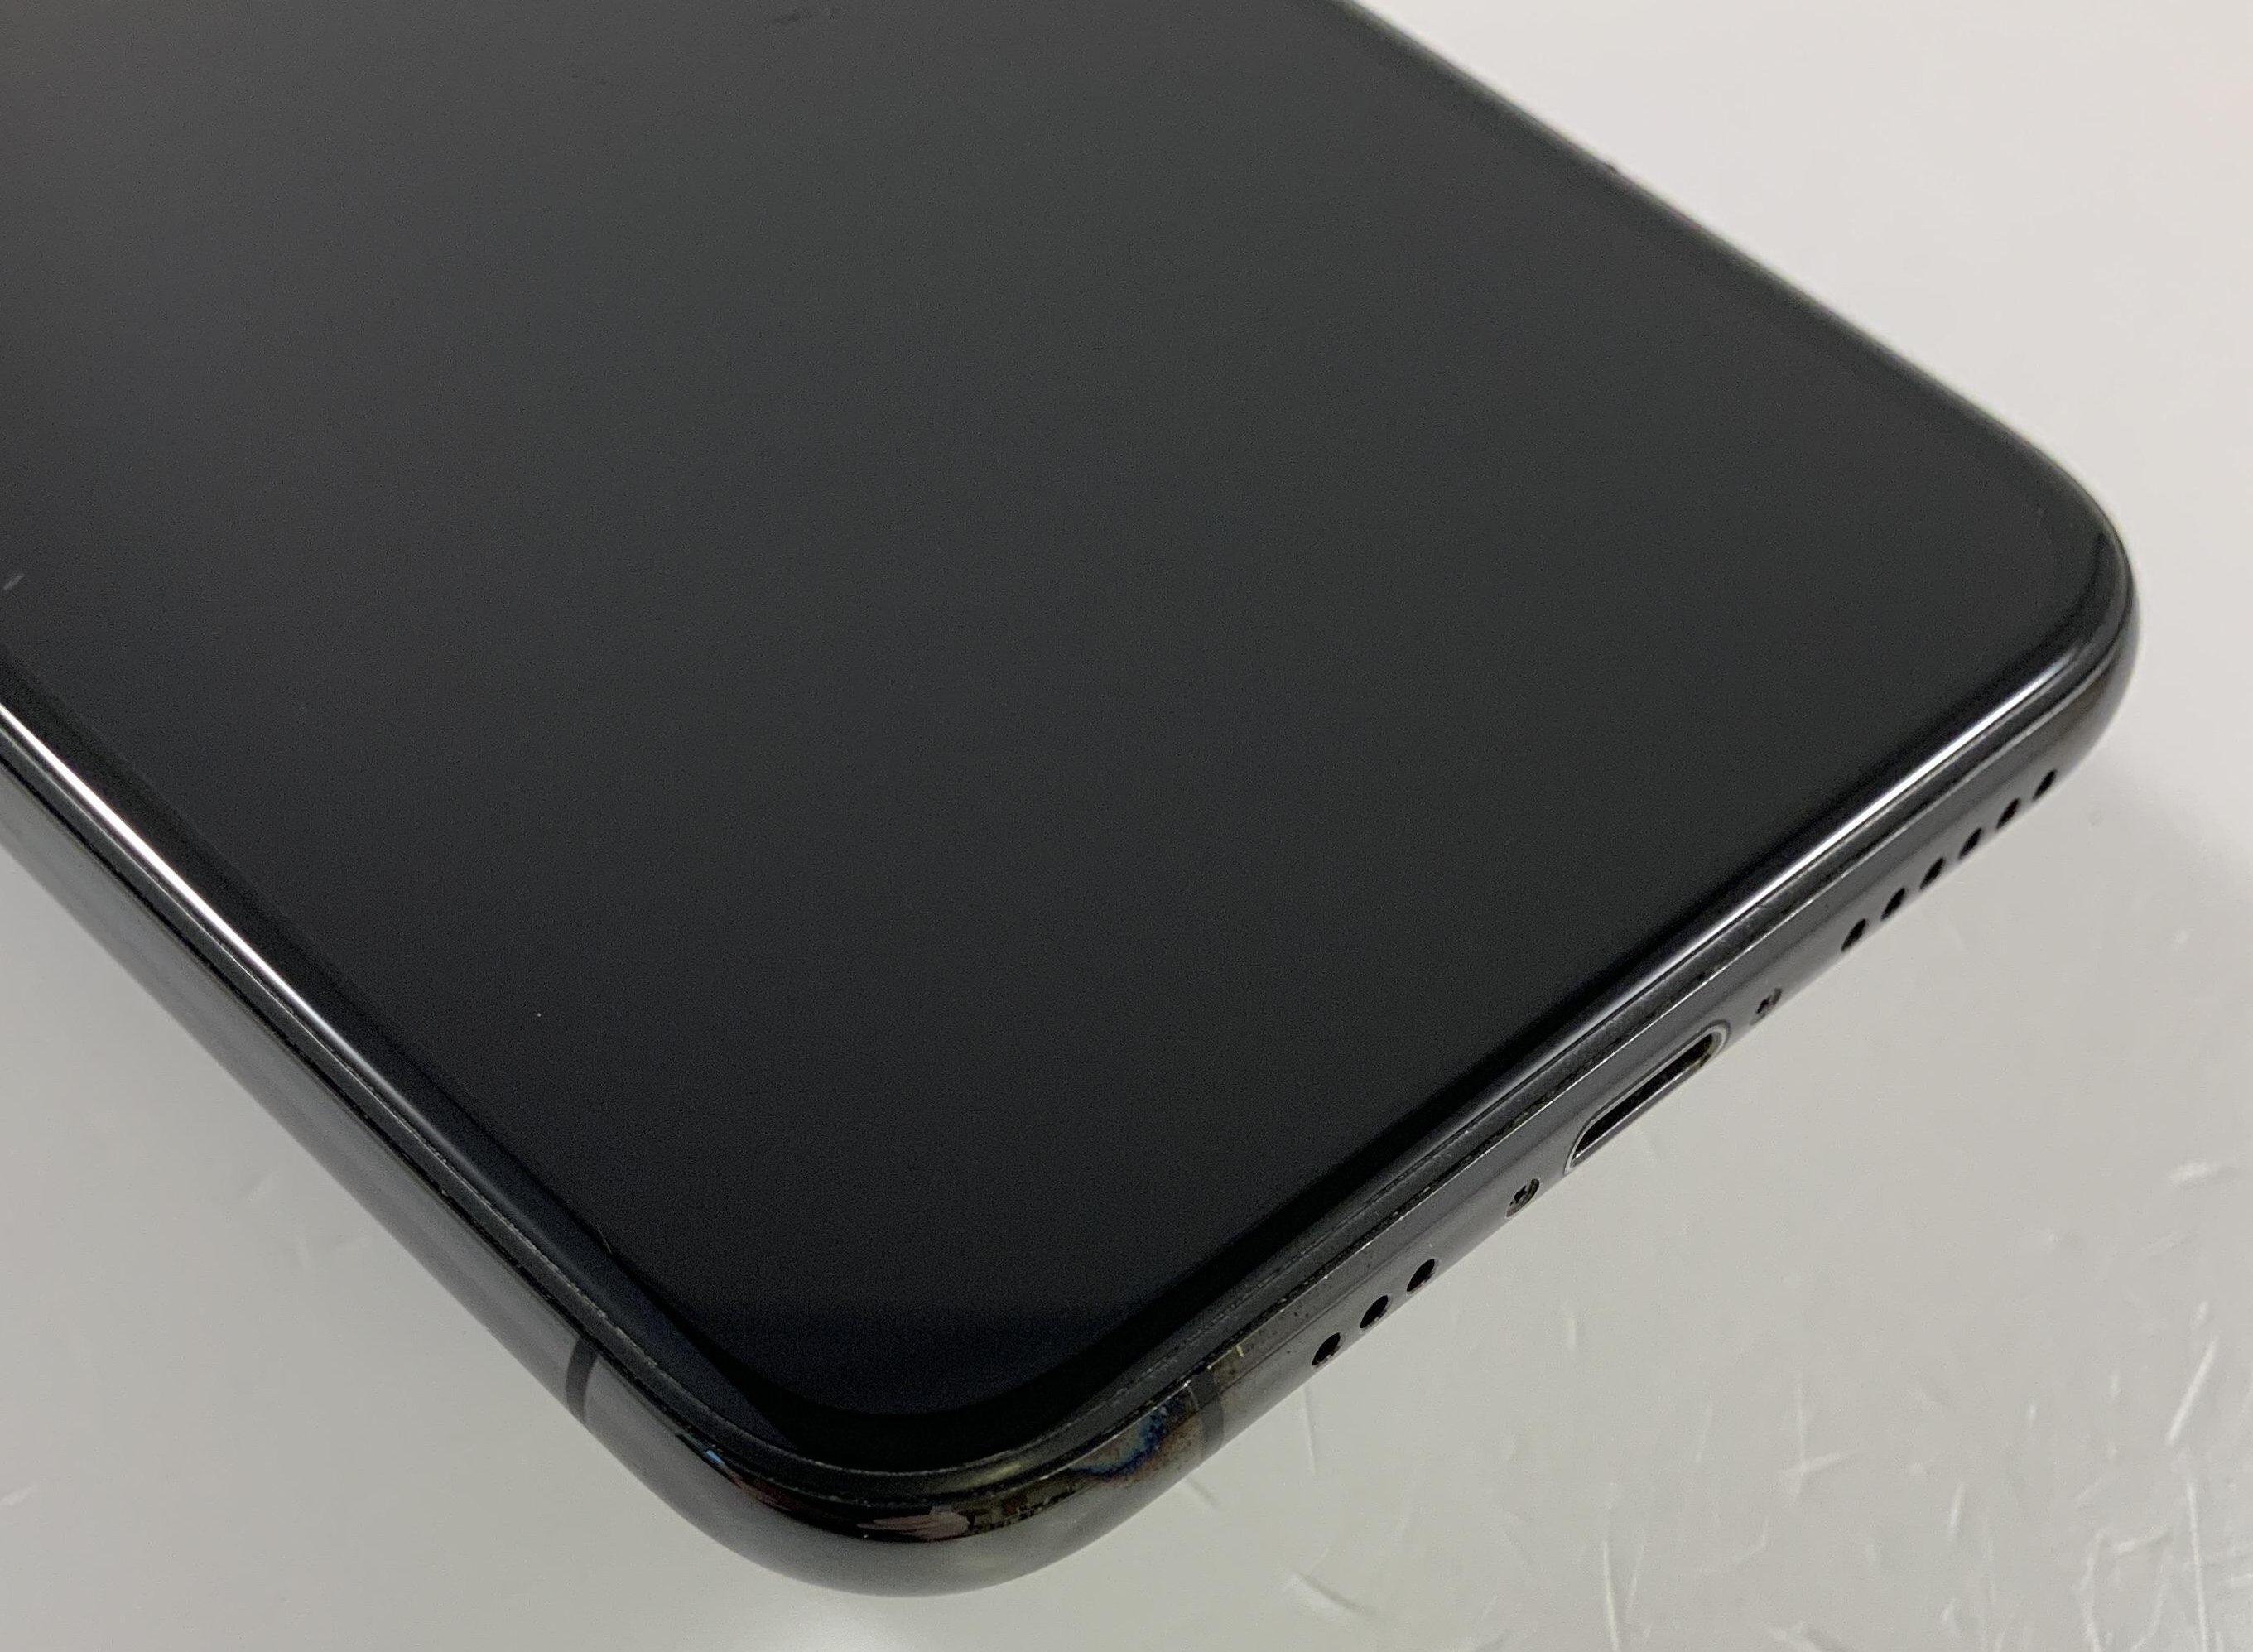 iPhone XS 64GB, 64GB, Space Gray, obraz 3